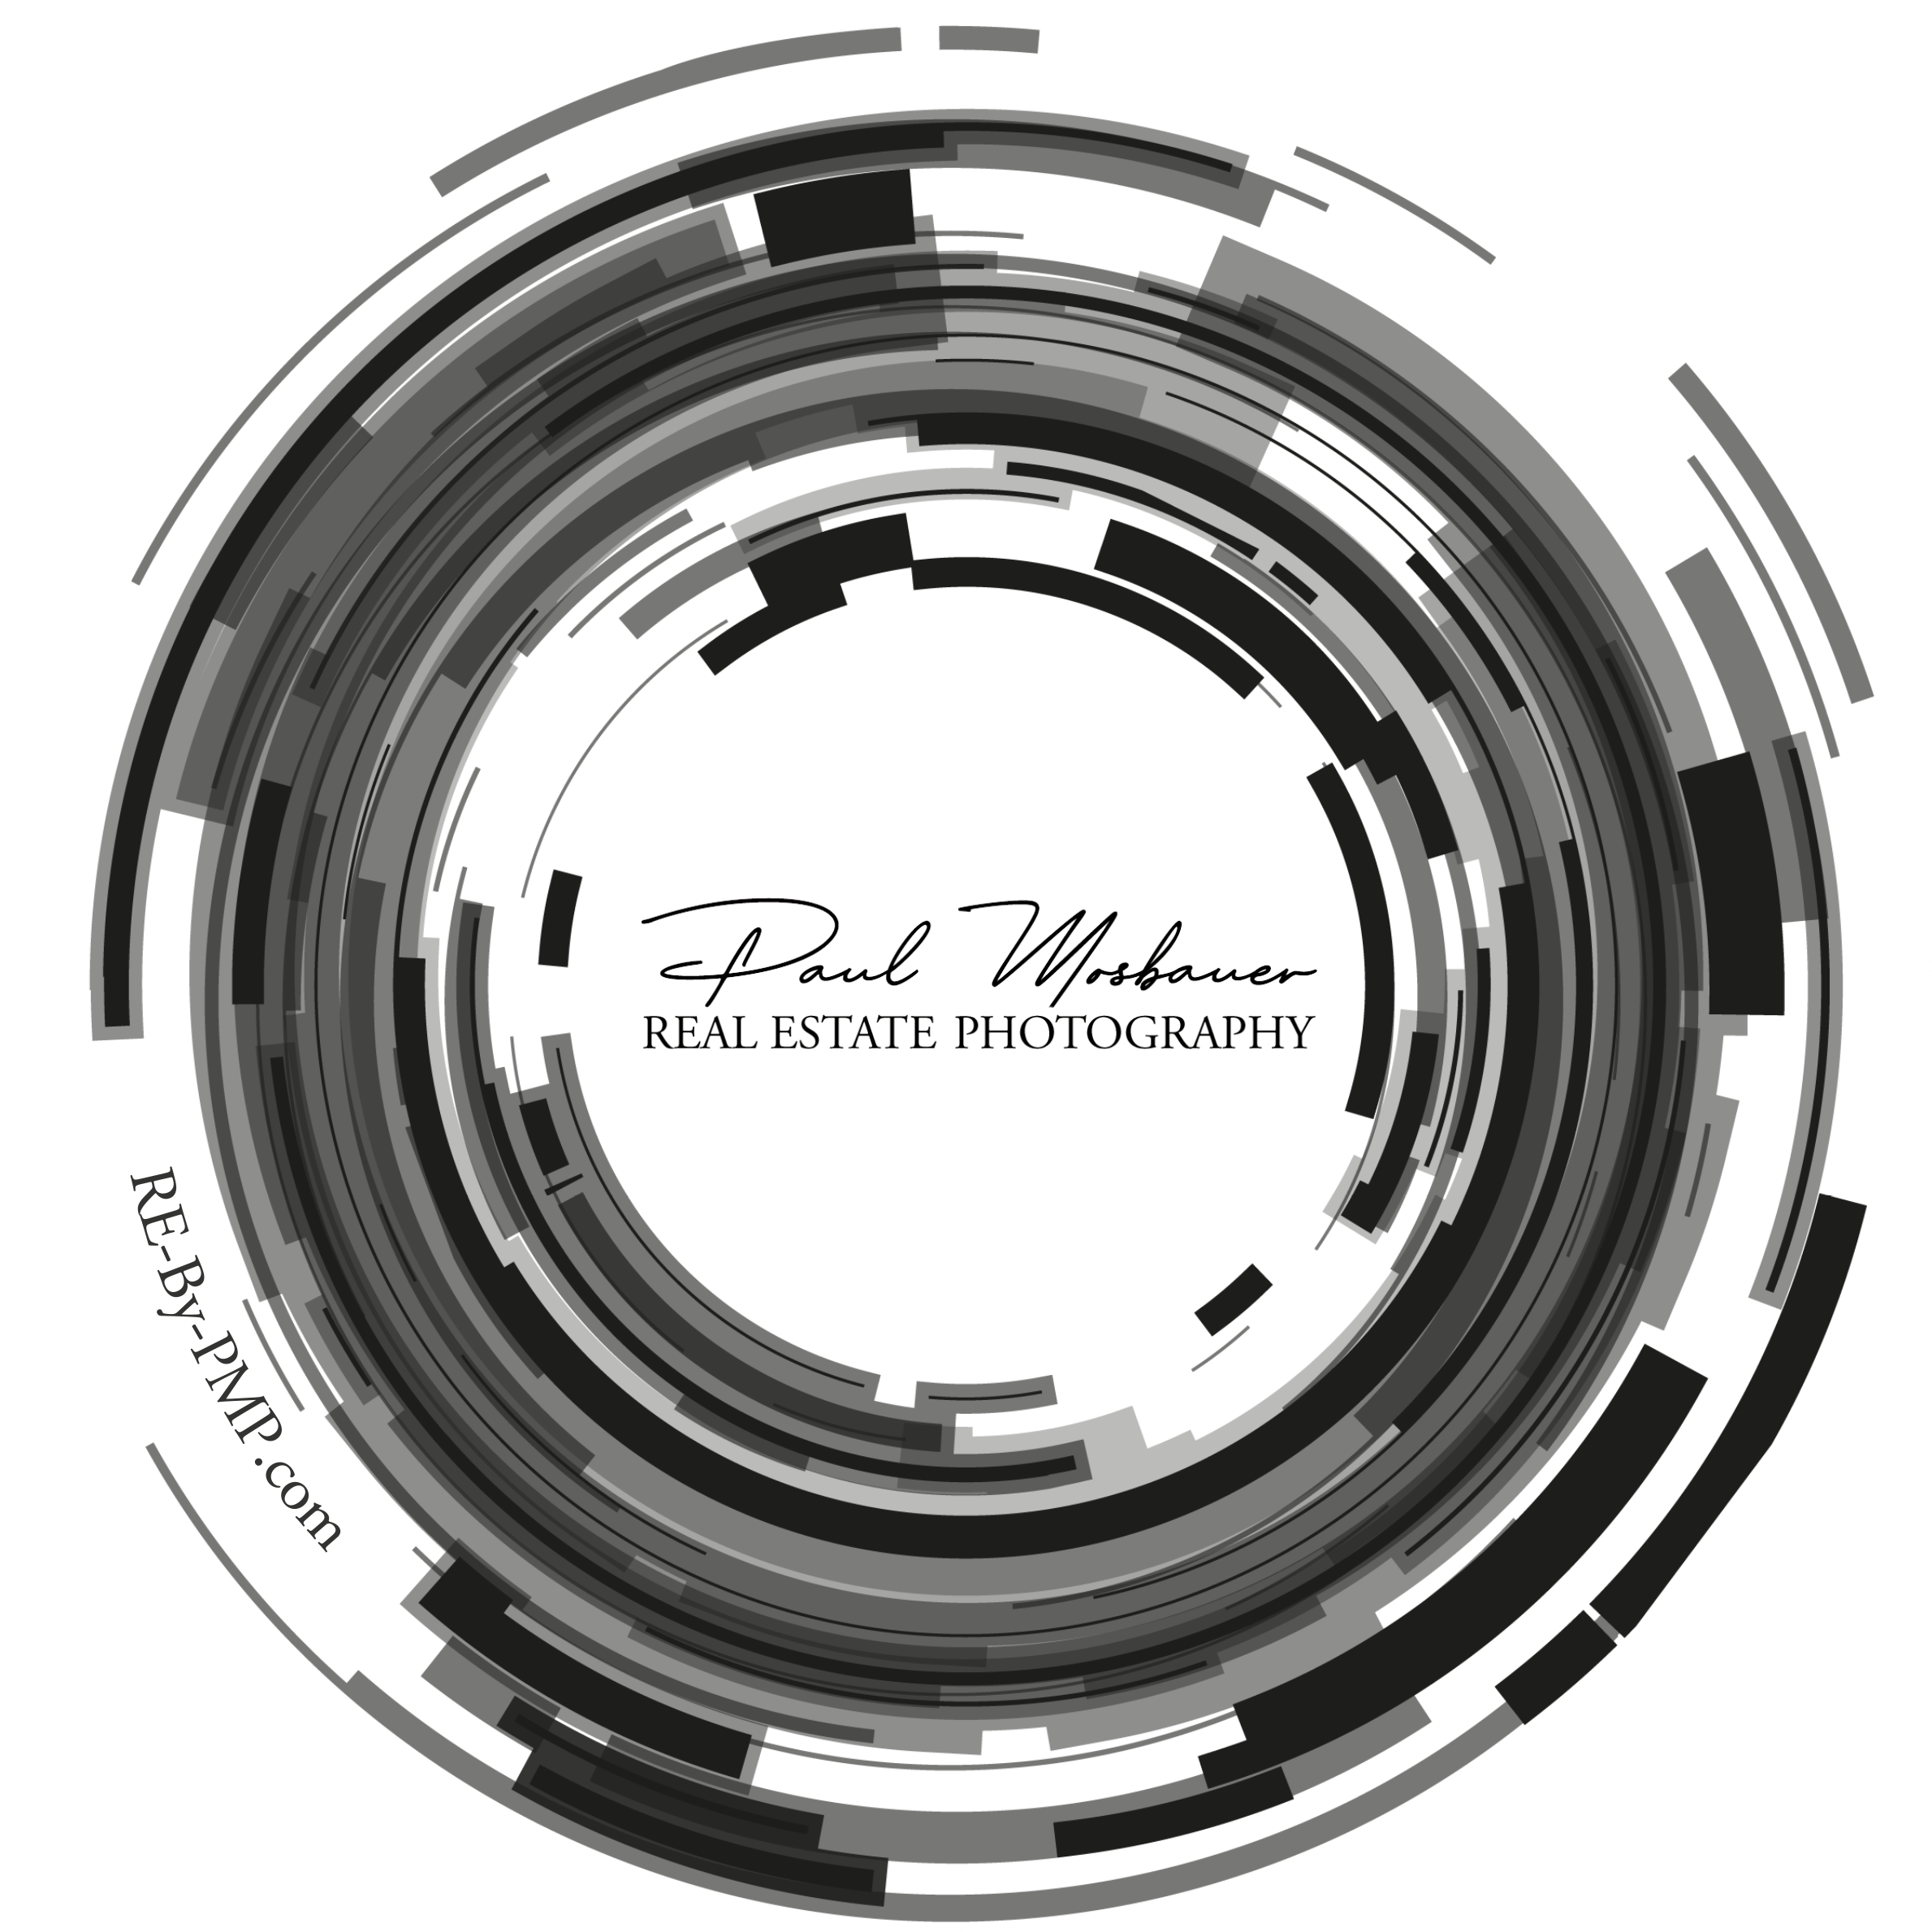 Real Estate Photographer logo